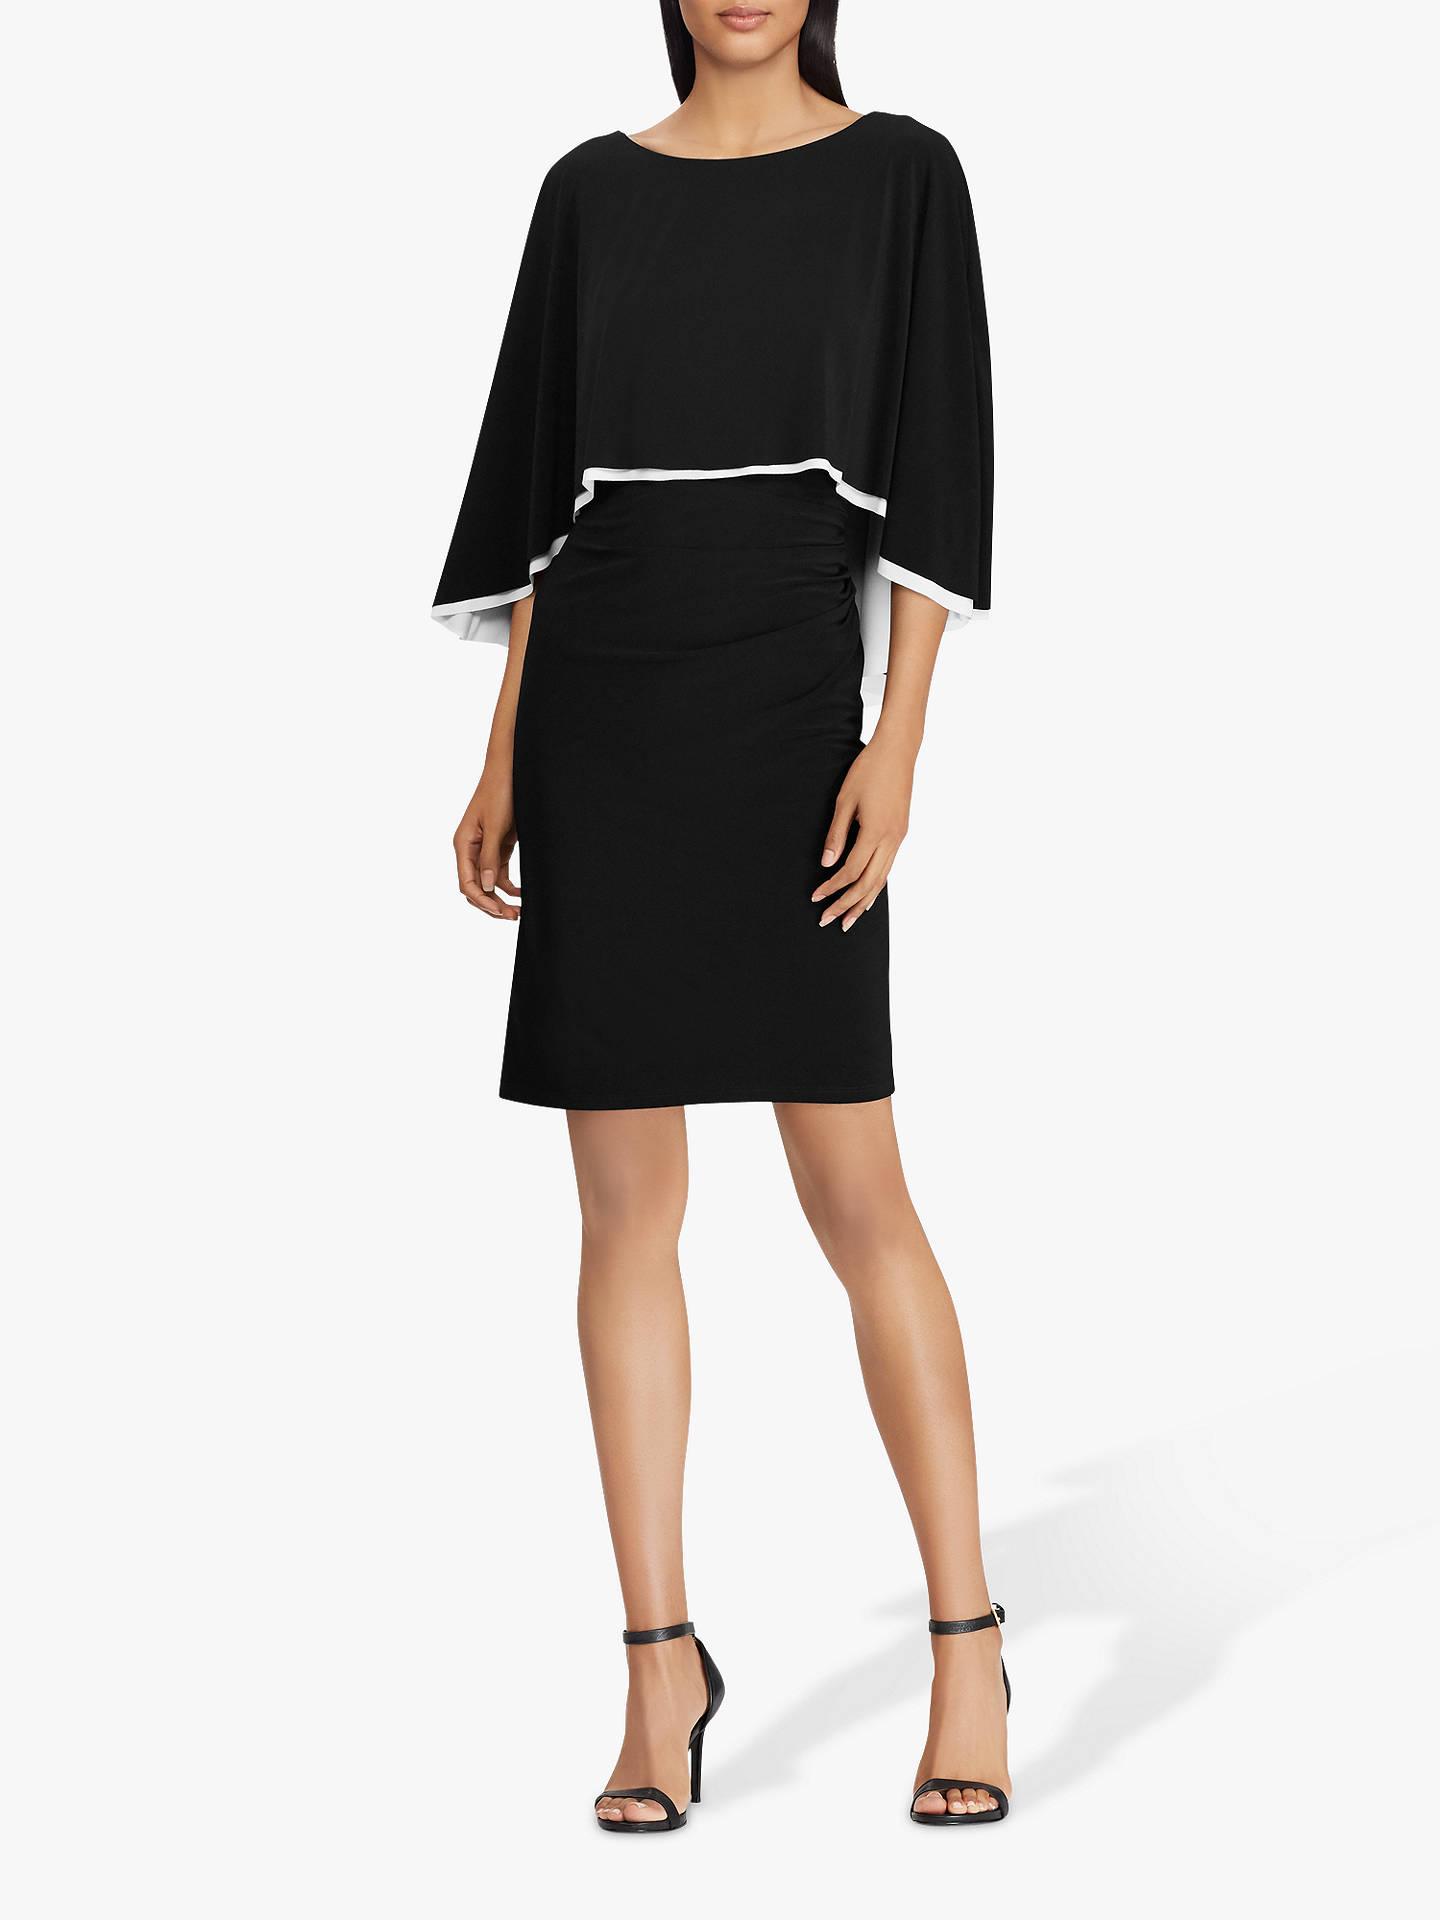 ad6f76286fa Buy Lauren Ralph Lauren Abriel Cape Dress